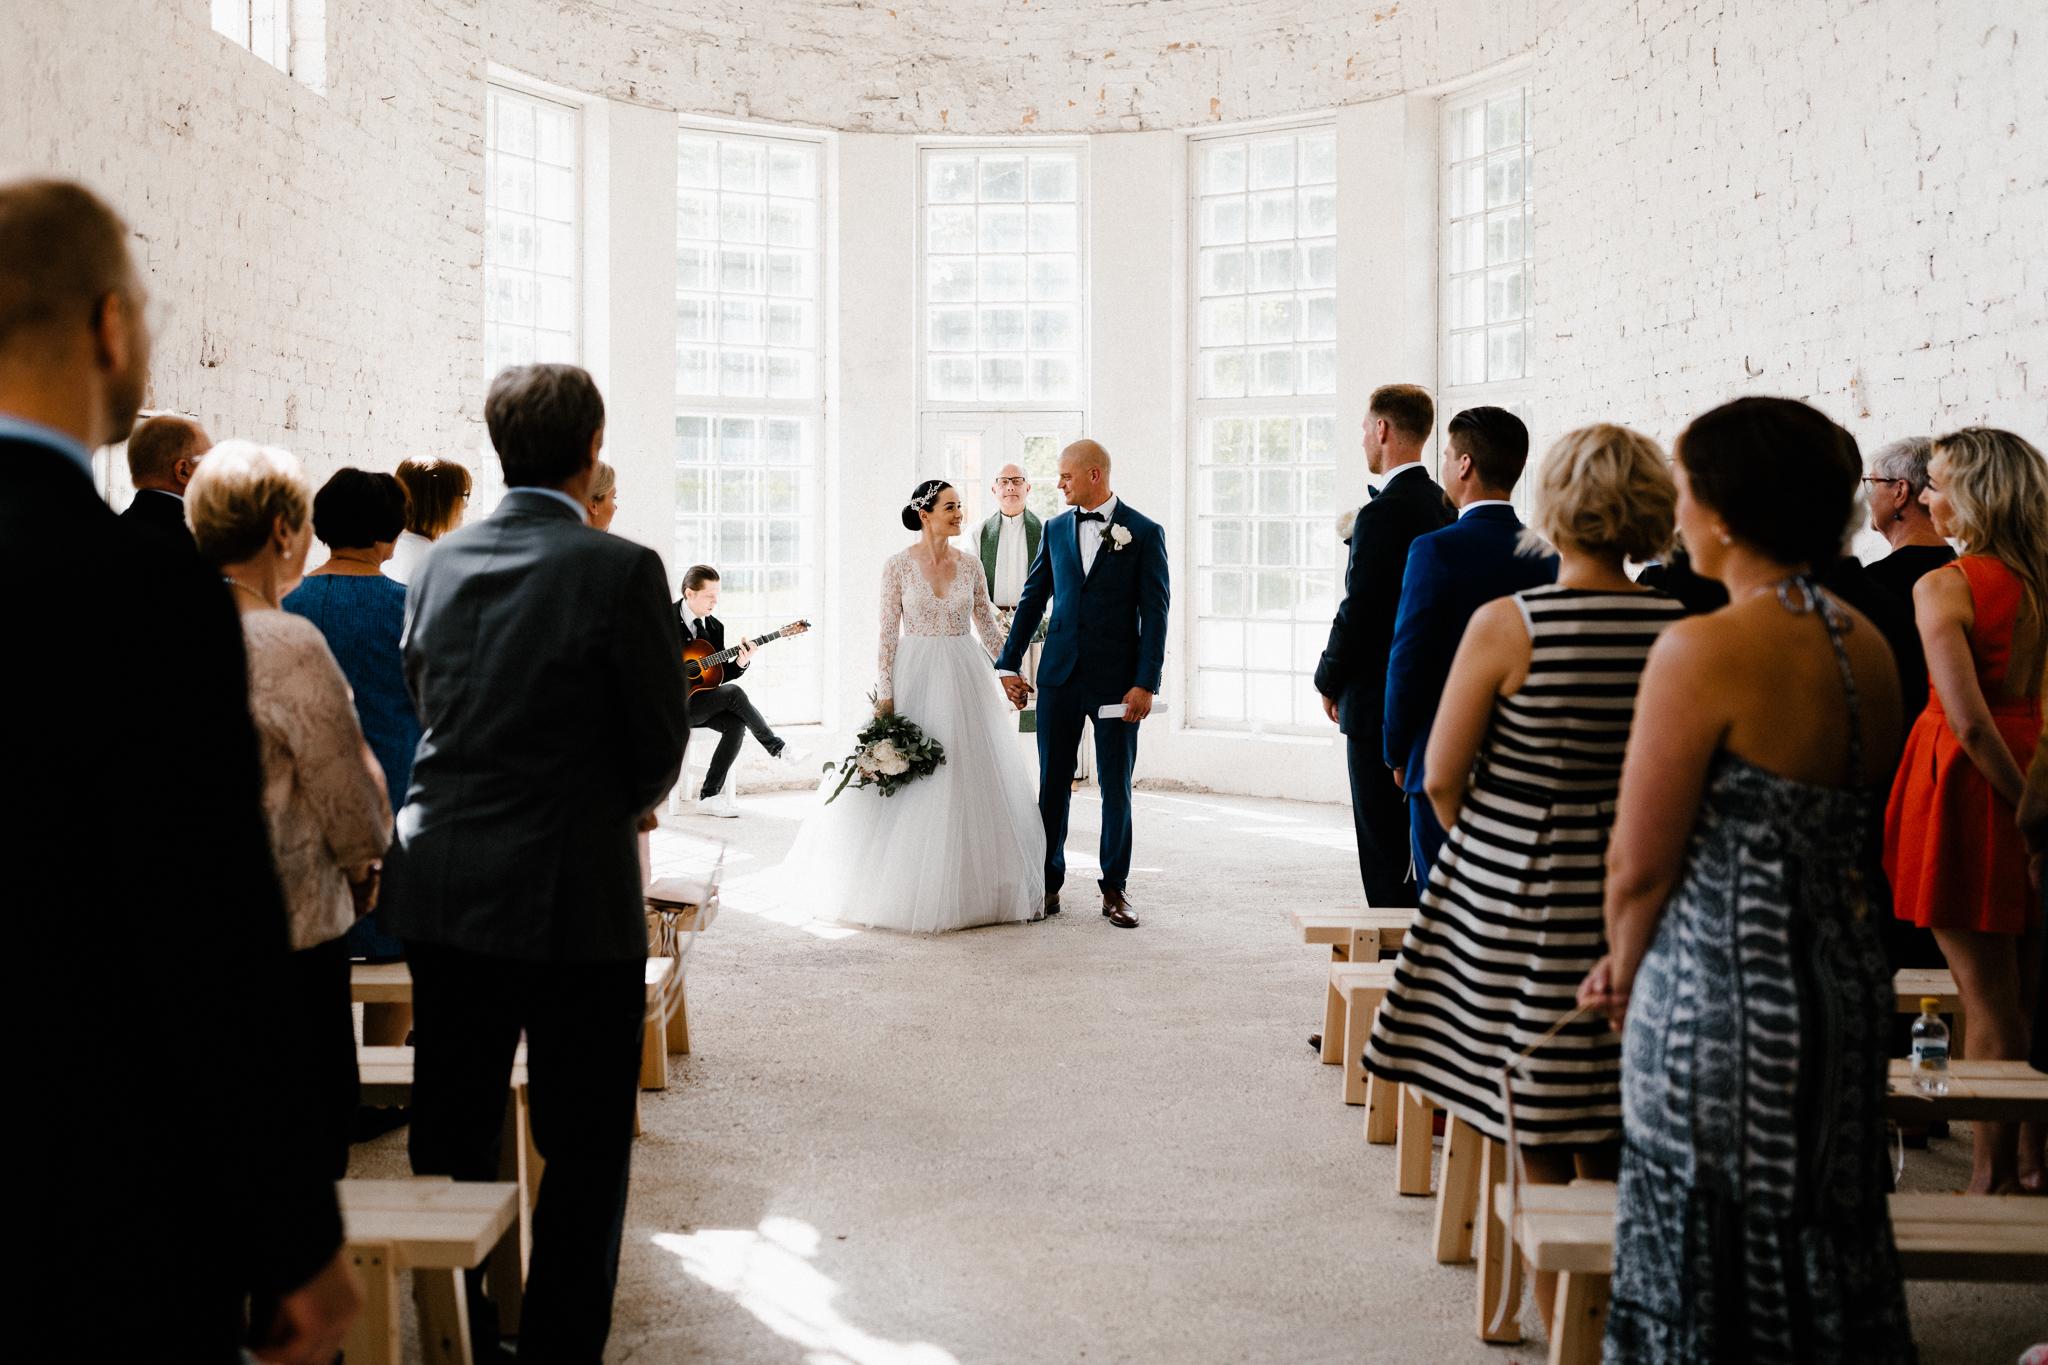 Essi + Ville   Oitbacka Gården   by Patrick Karkkolainen Wedding Photography-161.jpg